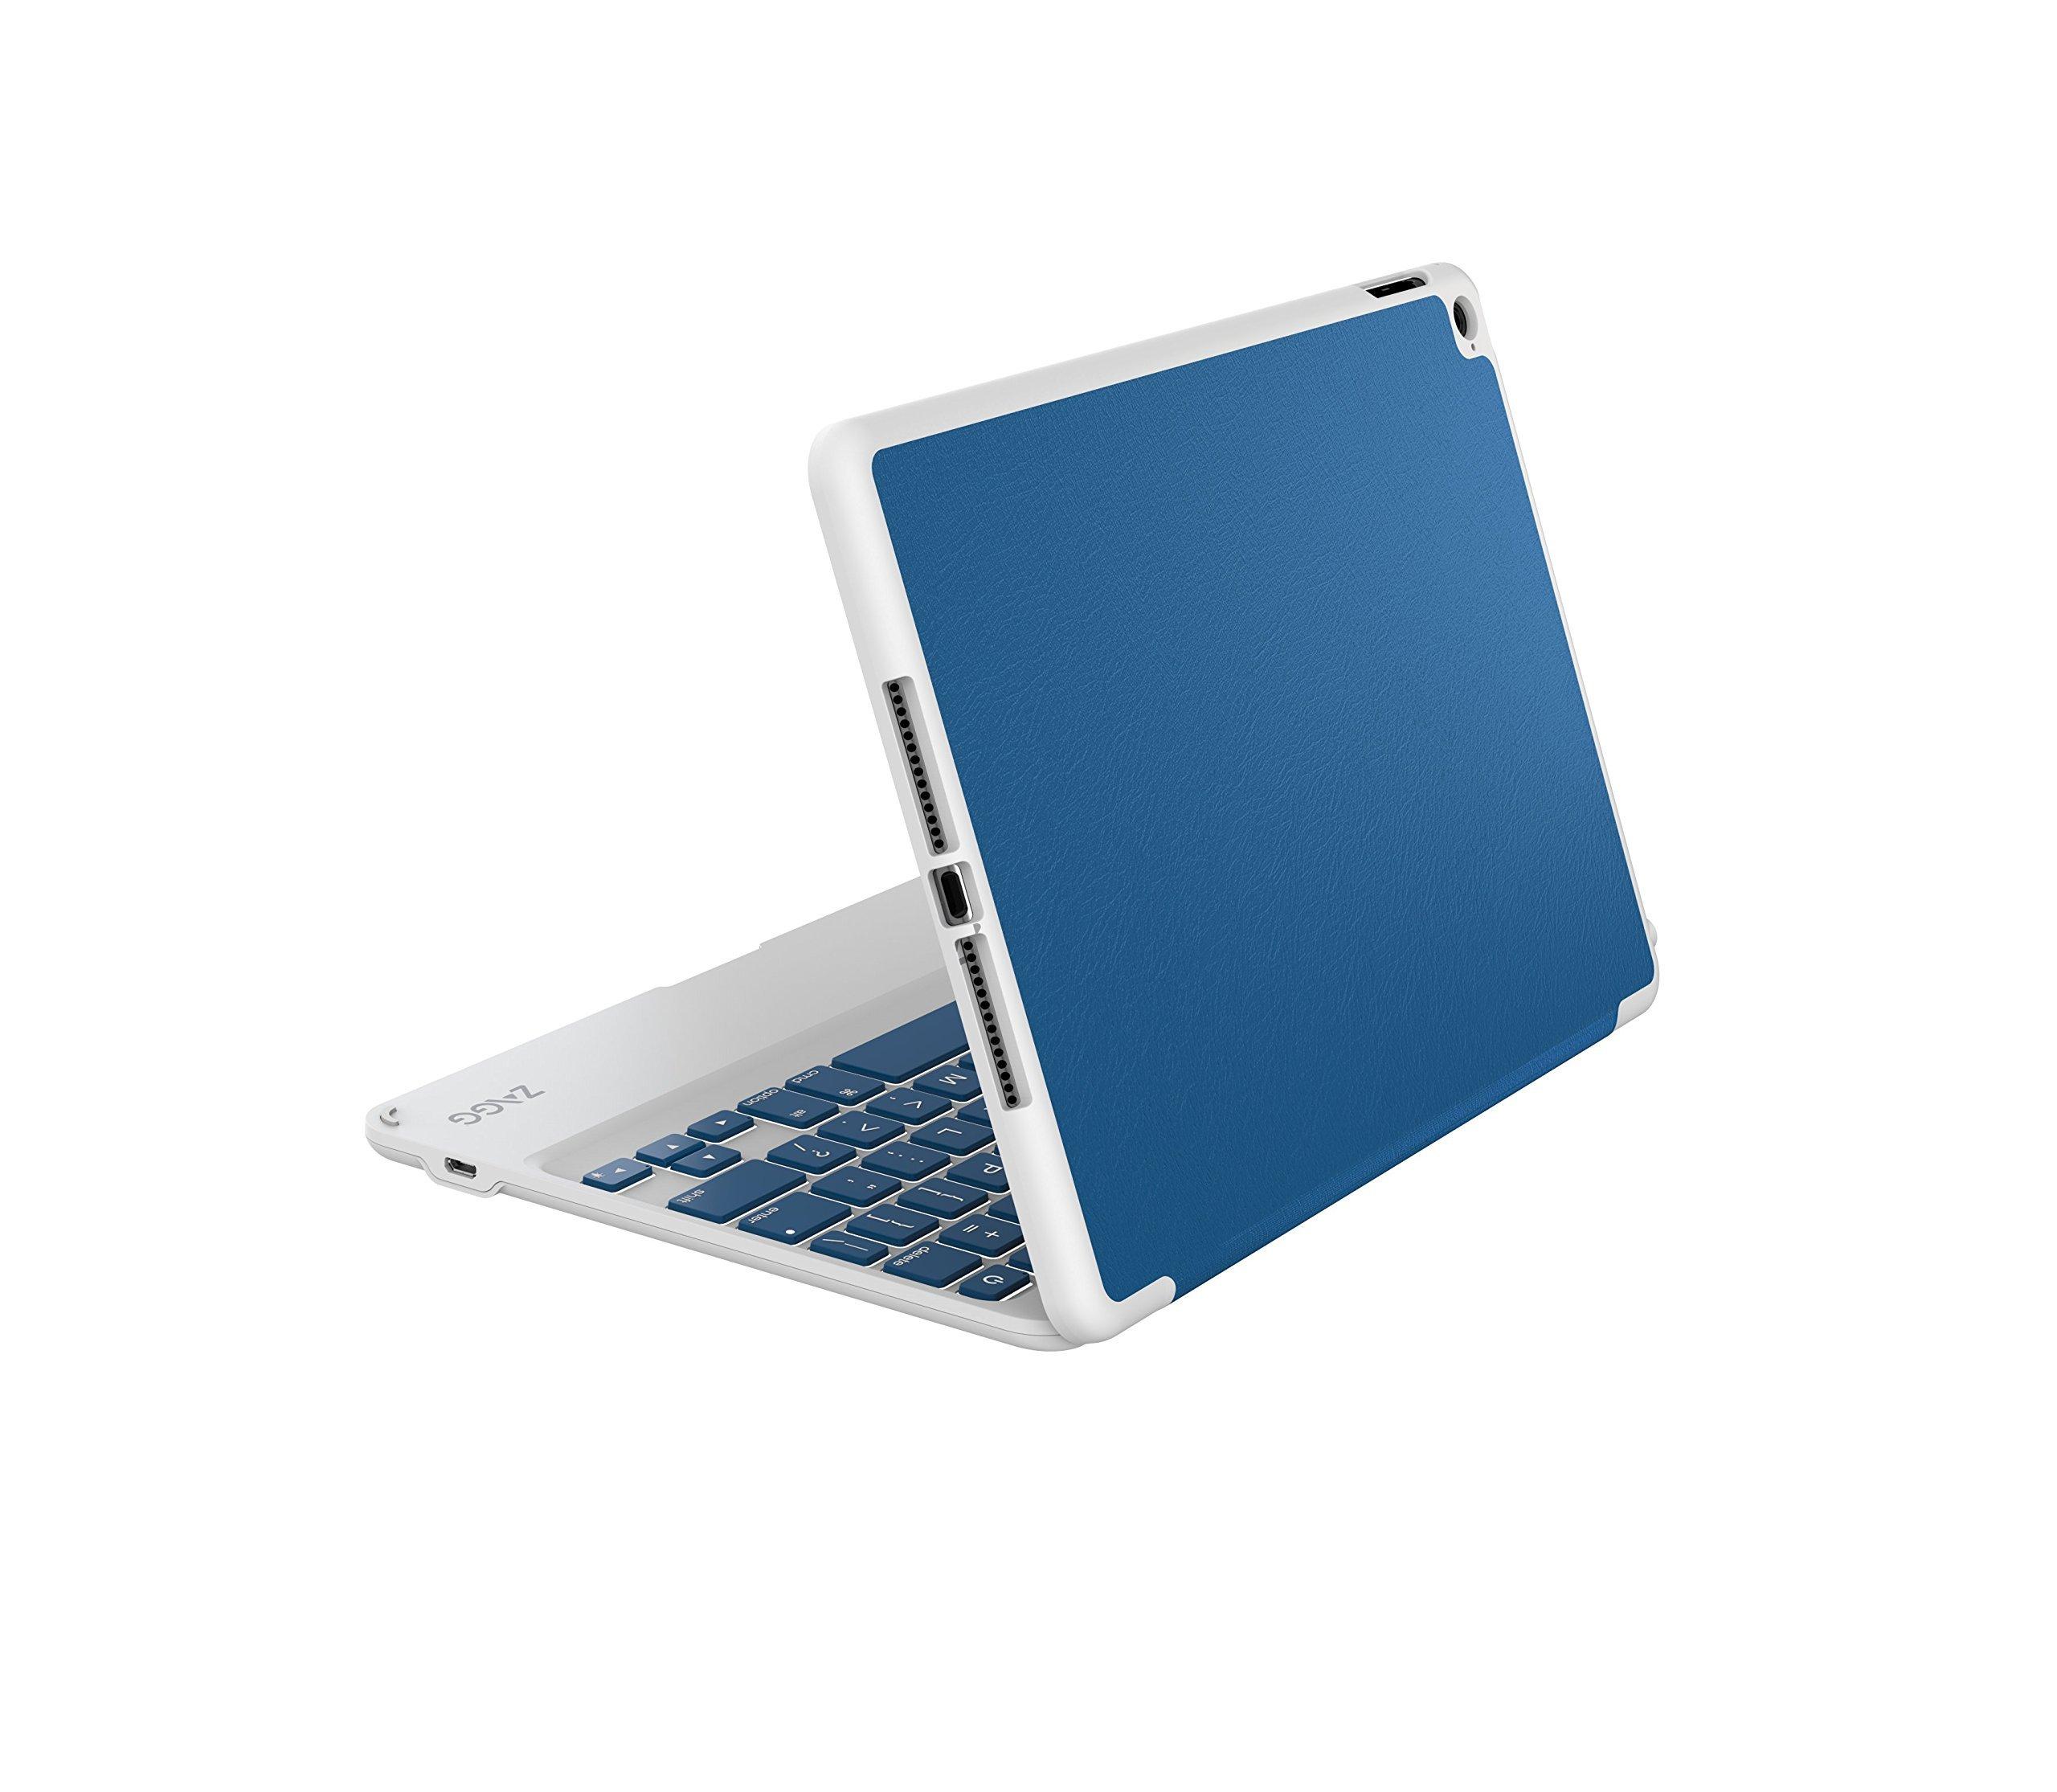 ZAGG Folio Case, Hinged with Bluetooth Keyboard for iPad Air 2 - Blue